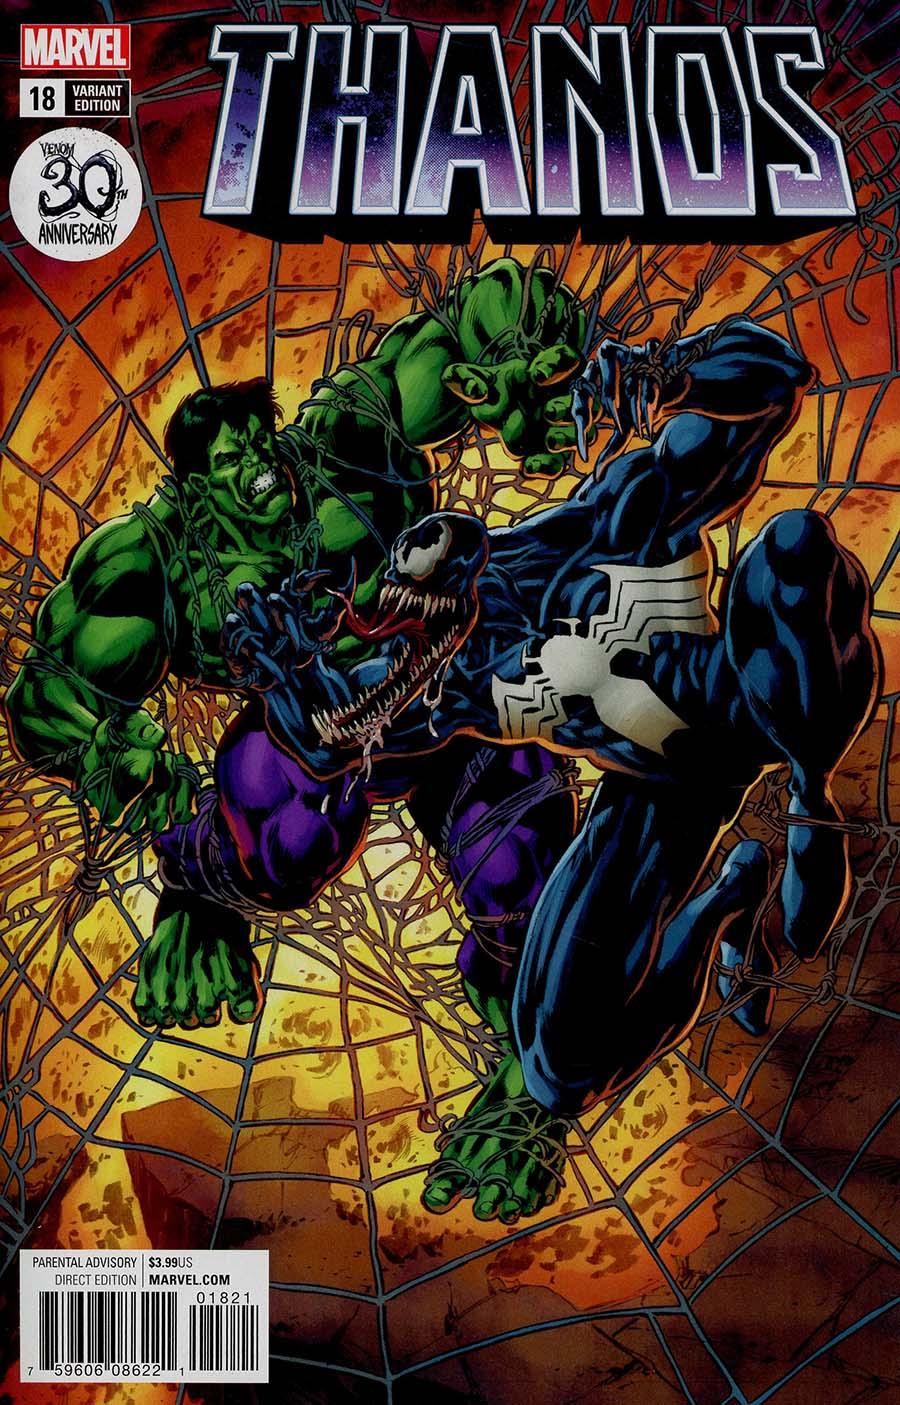 Thanos Vol 2 #18 Cover B Variant Mike Perkins Venom 30th Anniversary Cover